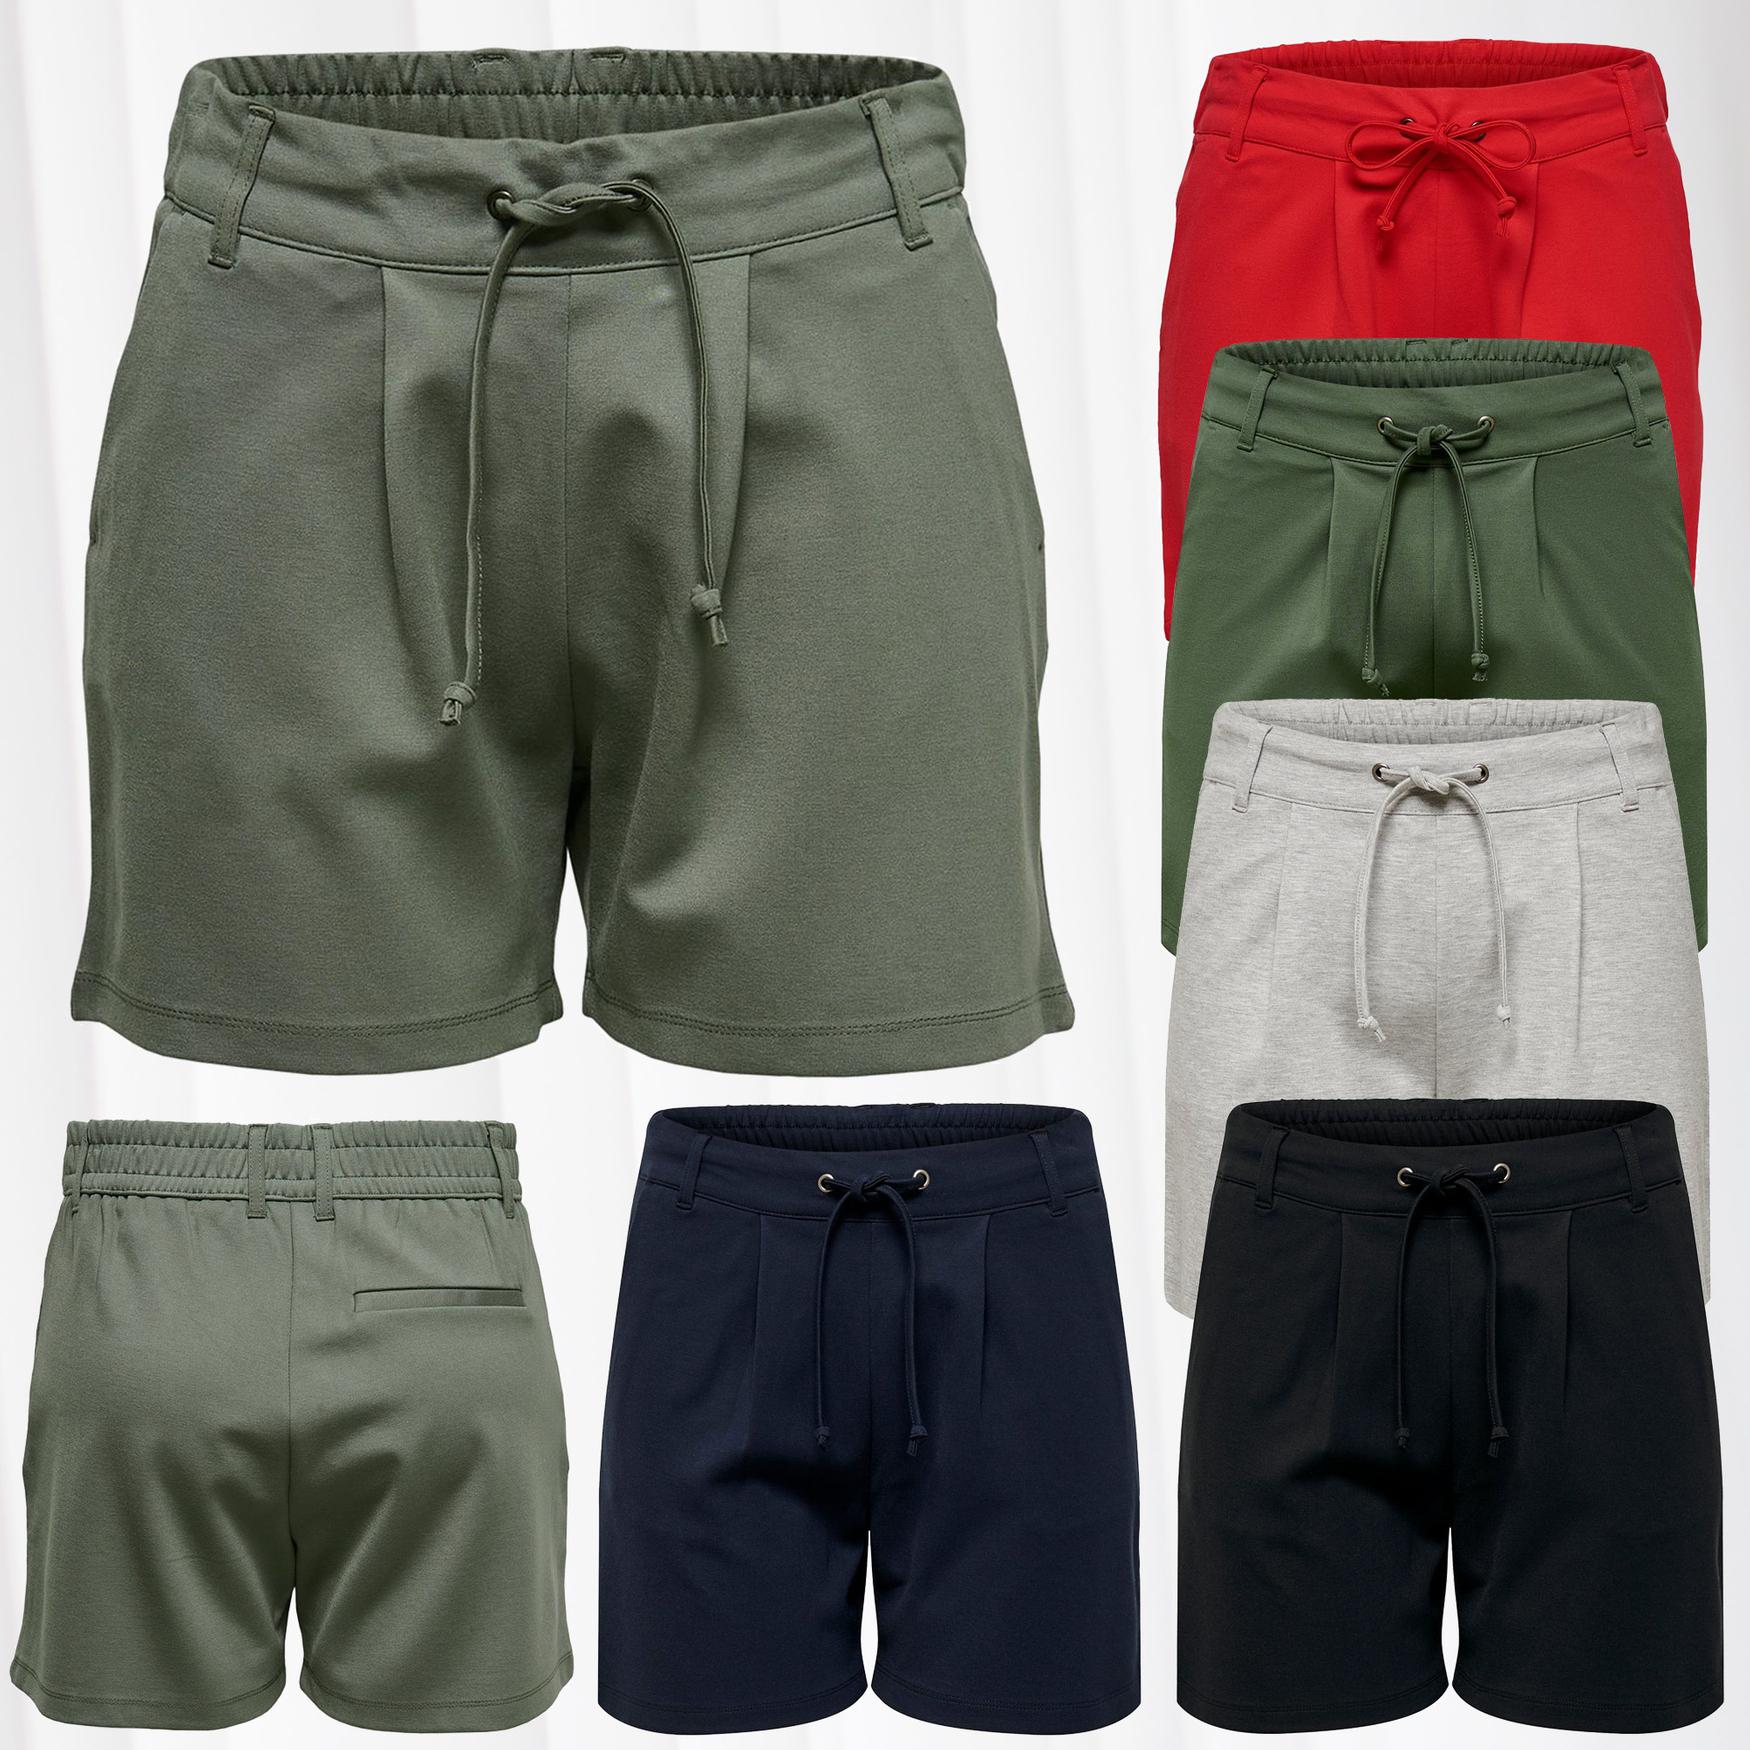 JDY Damen Jeans Shorts Sommer Stoffhose Chino Kurz  Pants Stretch Casual Push Up